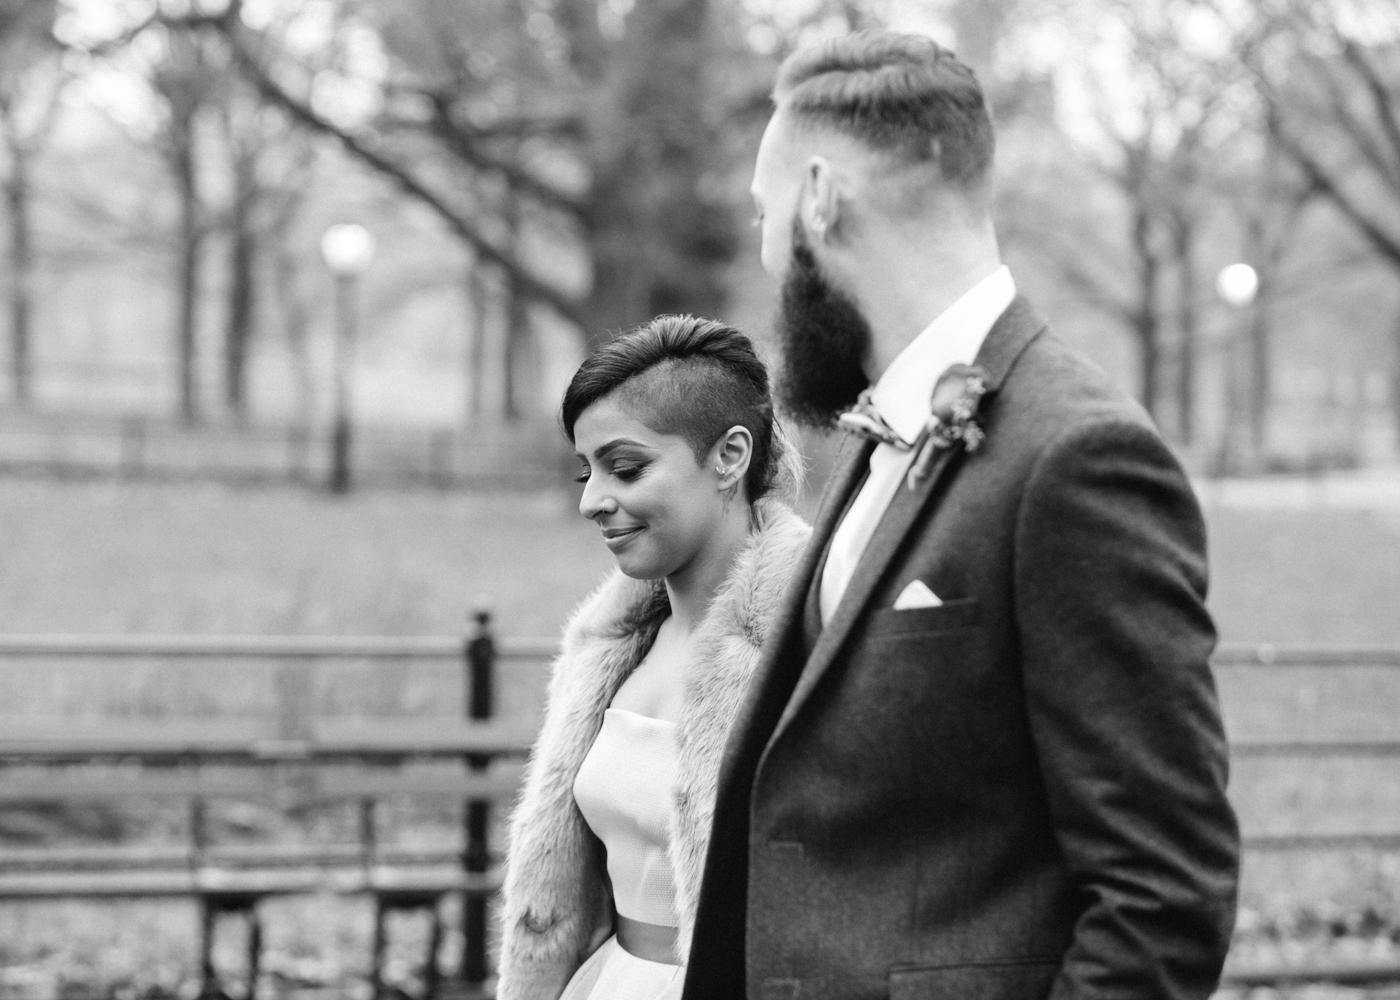 Central-park-wedding-by-Tanya-Isaeva-118.jpg